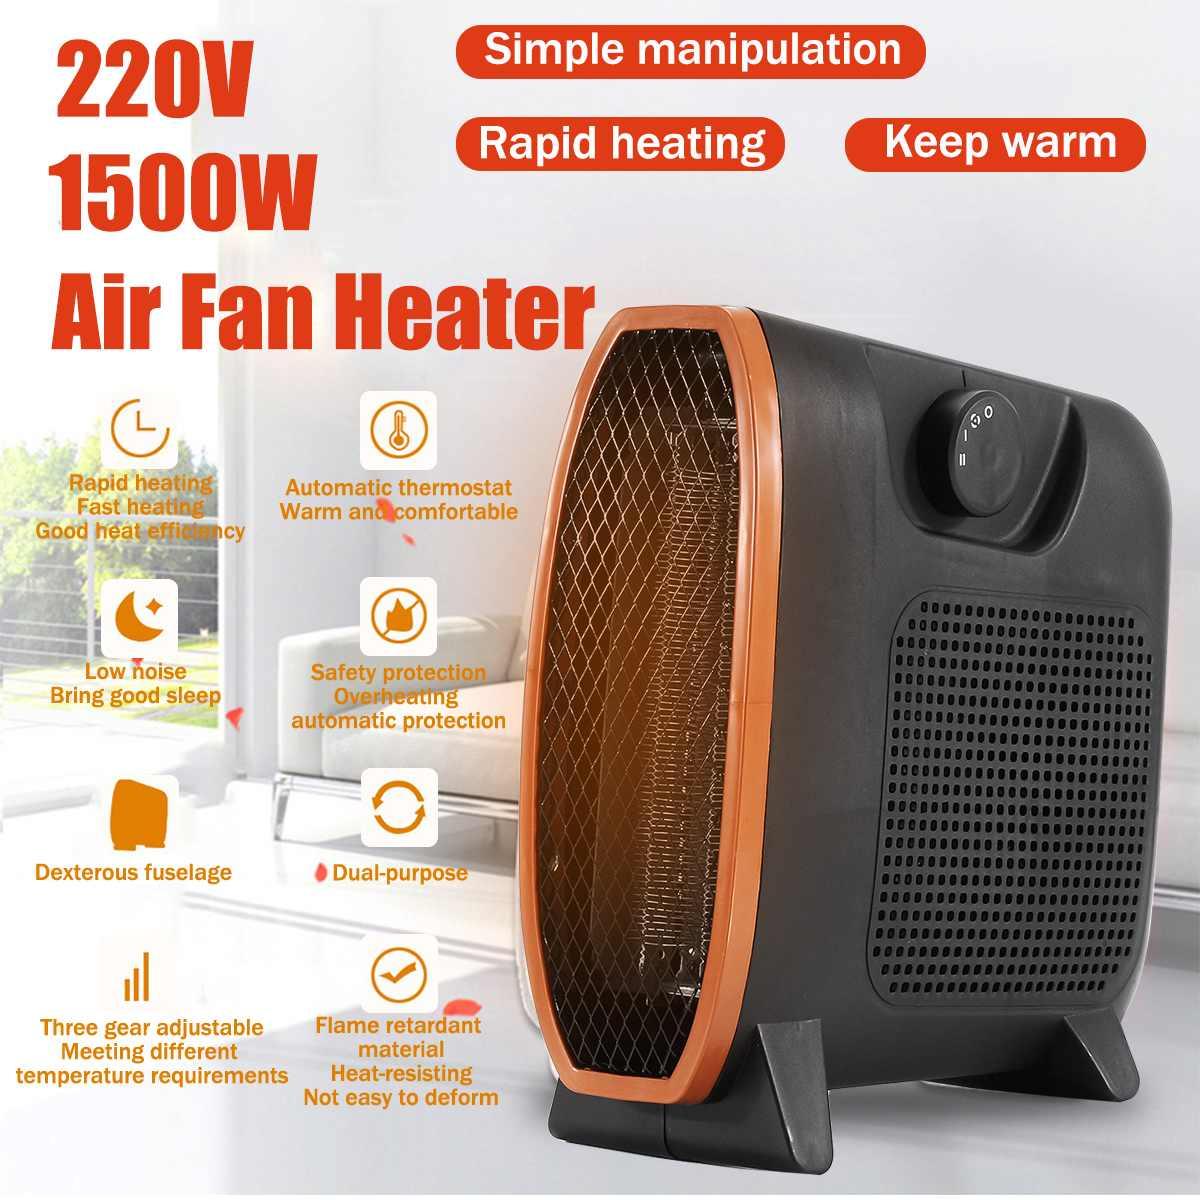 220V 1500W Electric Heater Mini Fan Heater Desktop Household Heating Stove Radiator Warmer Winter Handy Room Heater Air Cooler